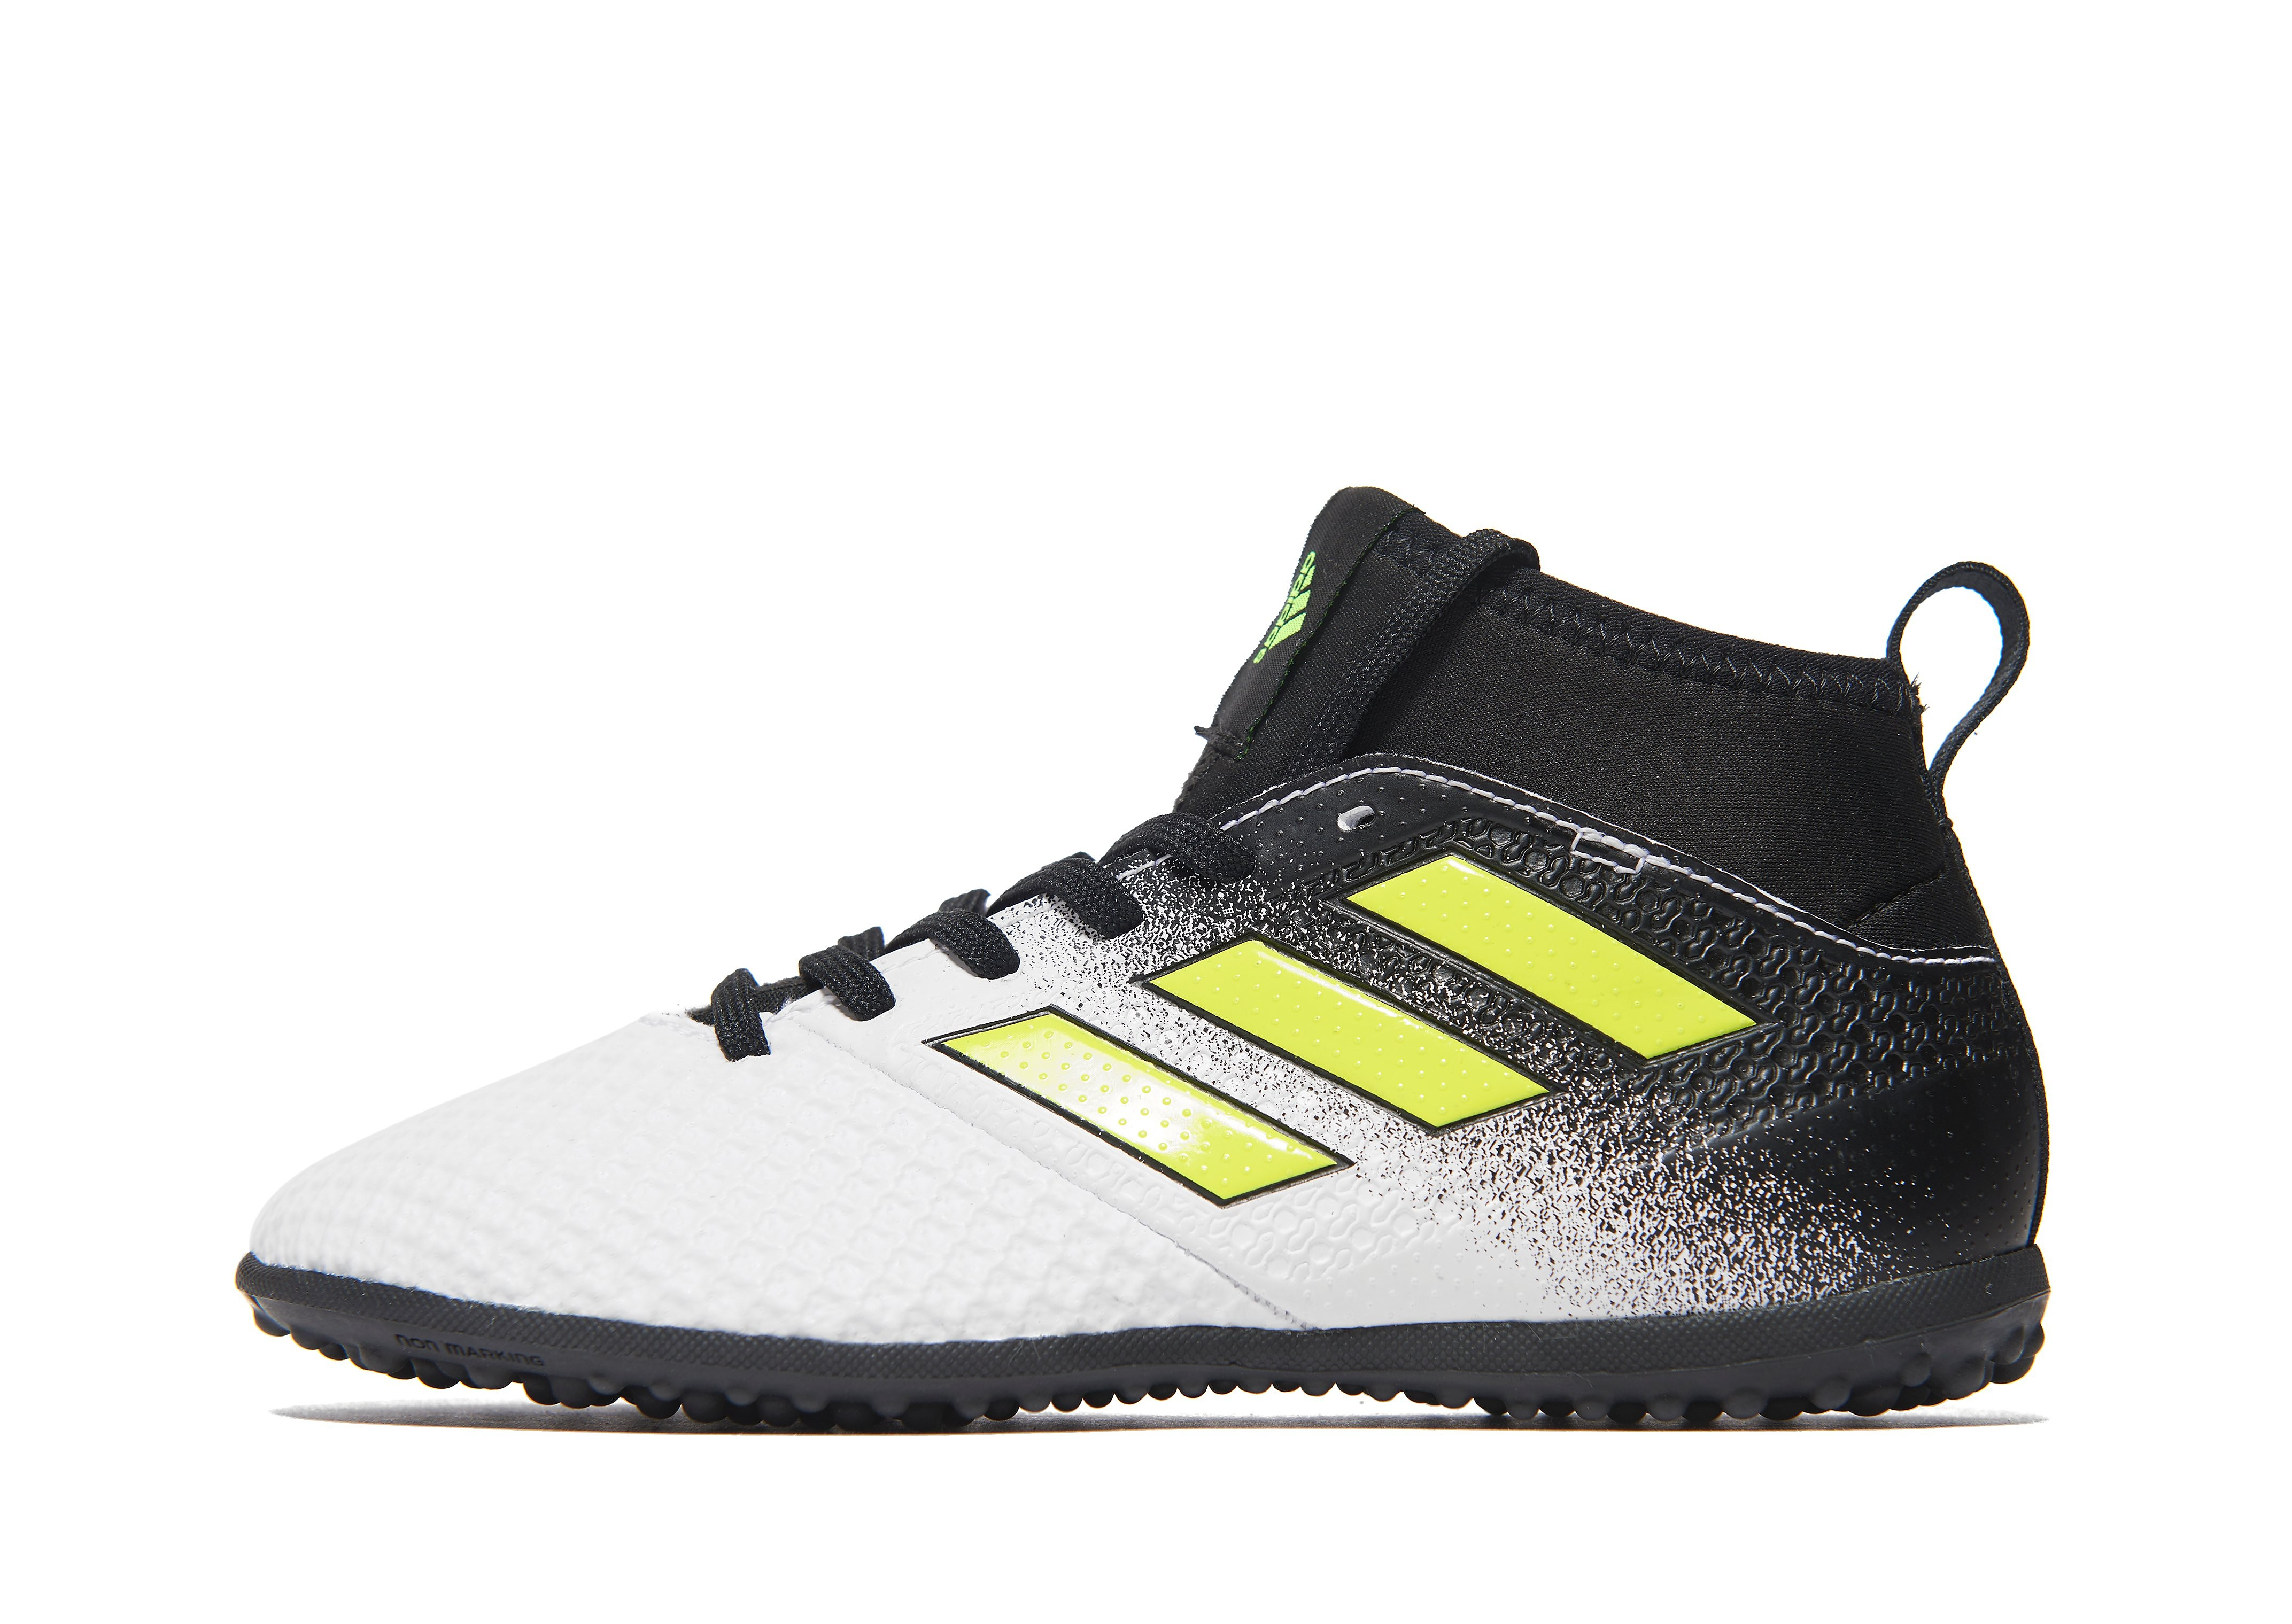 adidas Dust Storm ACE 17.3 Primemesh Turf Children